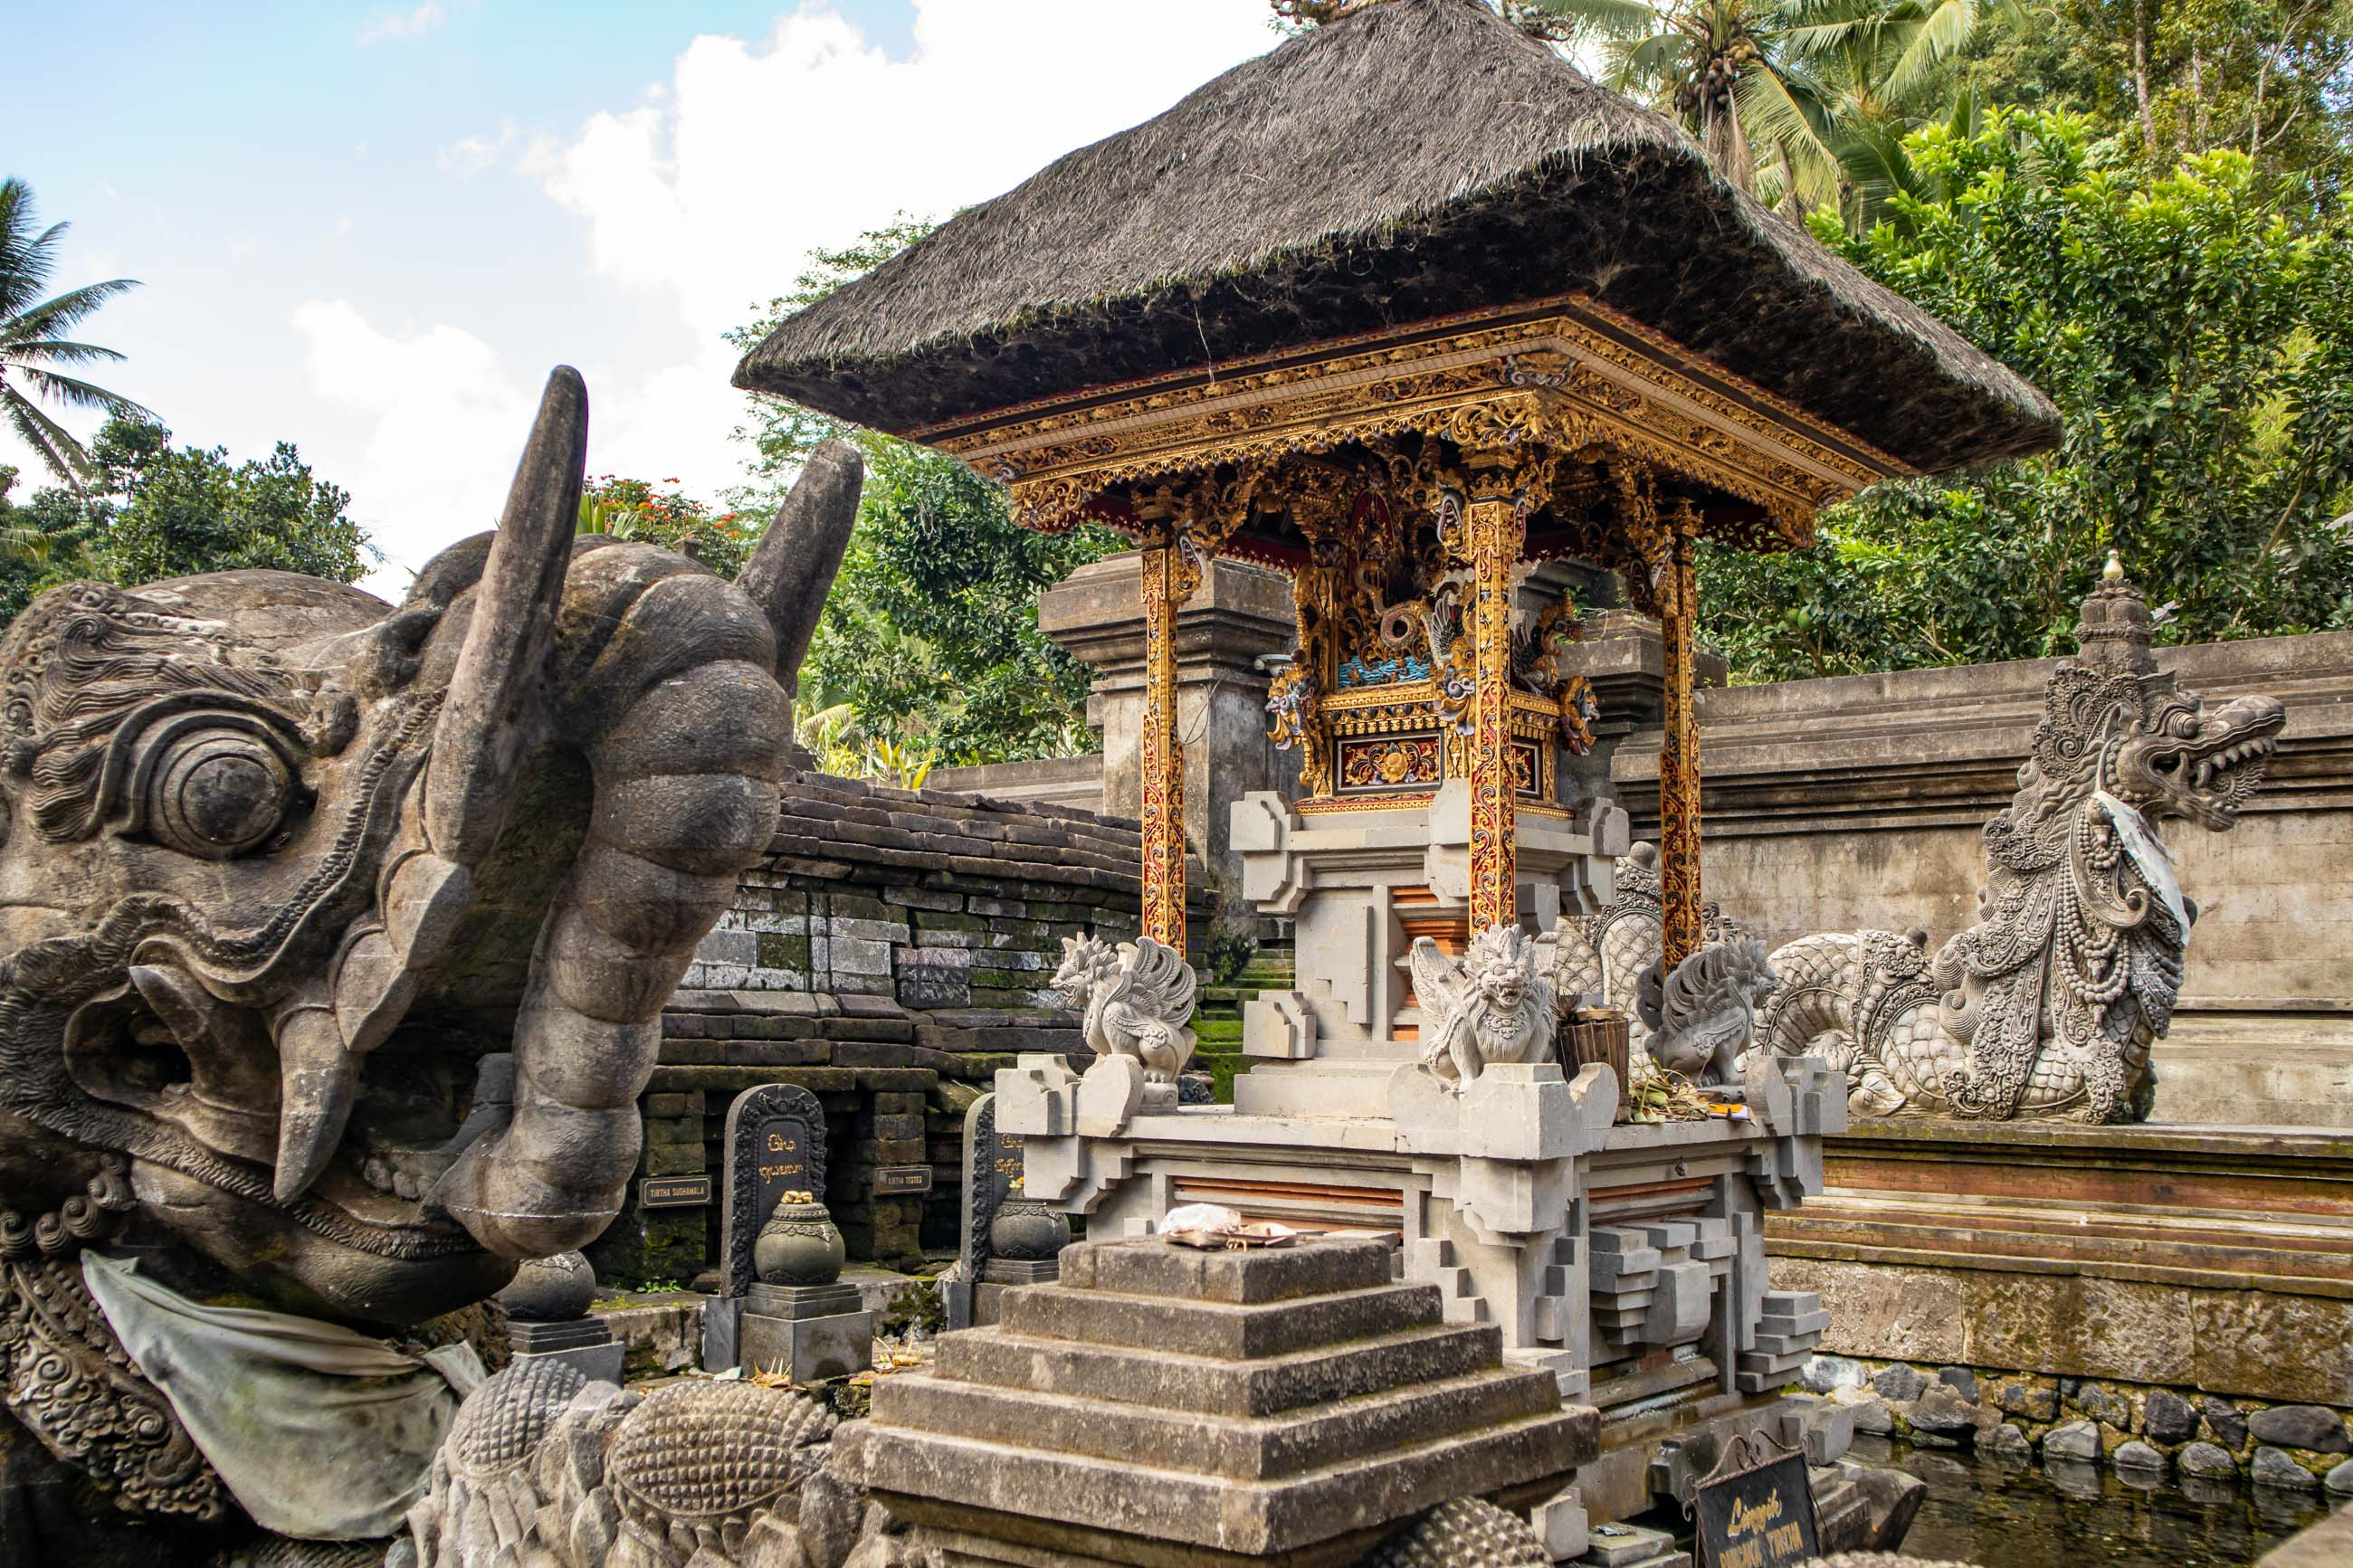 https://bubo.sk/uploads/galleries/7417/tomashornak_indonezia_bali_img_0456-1-76.jpg